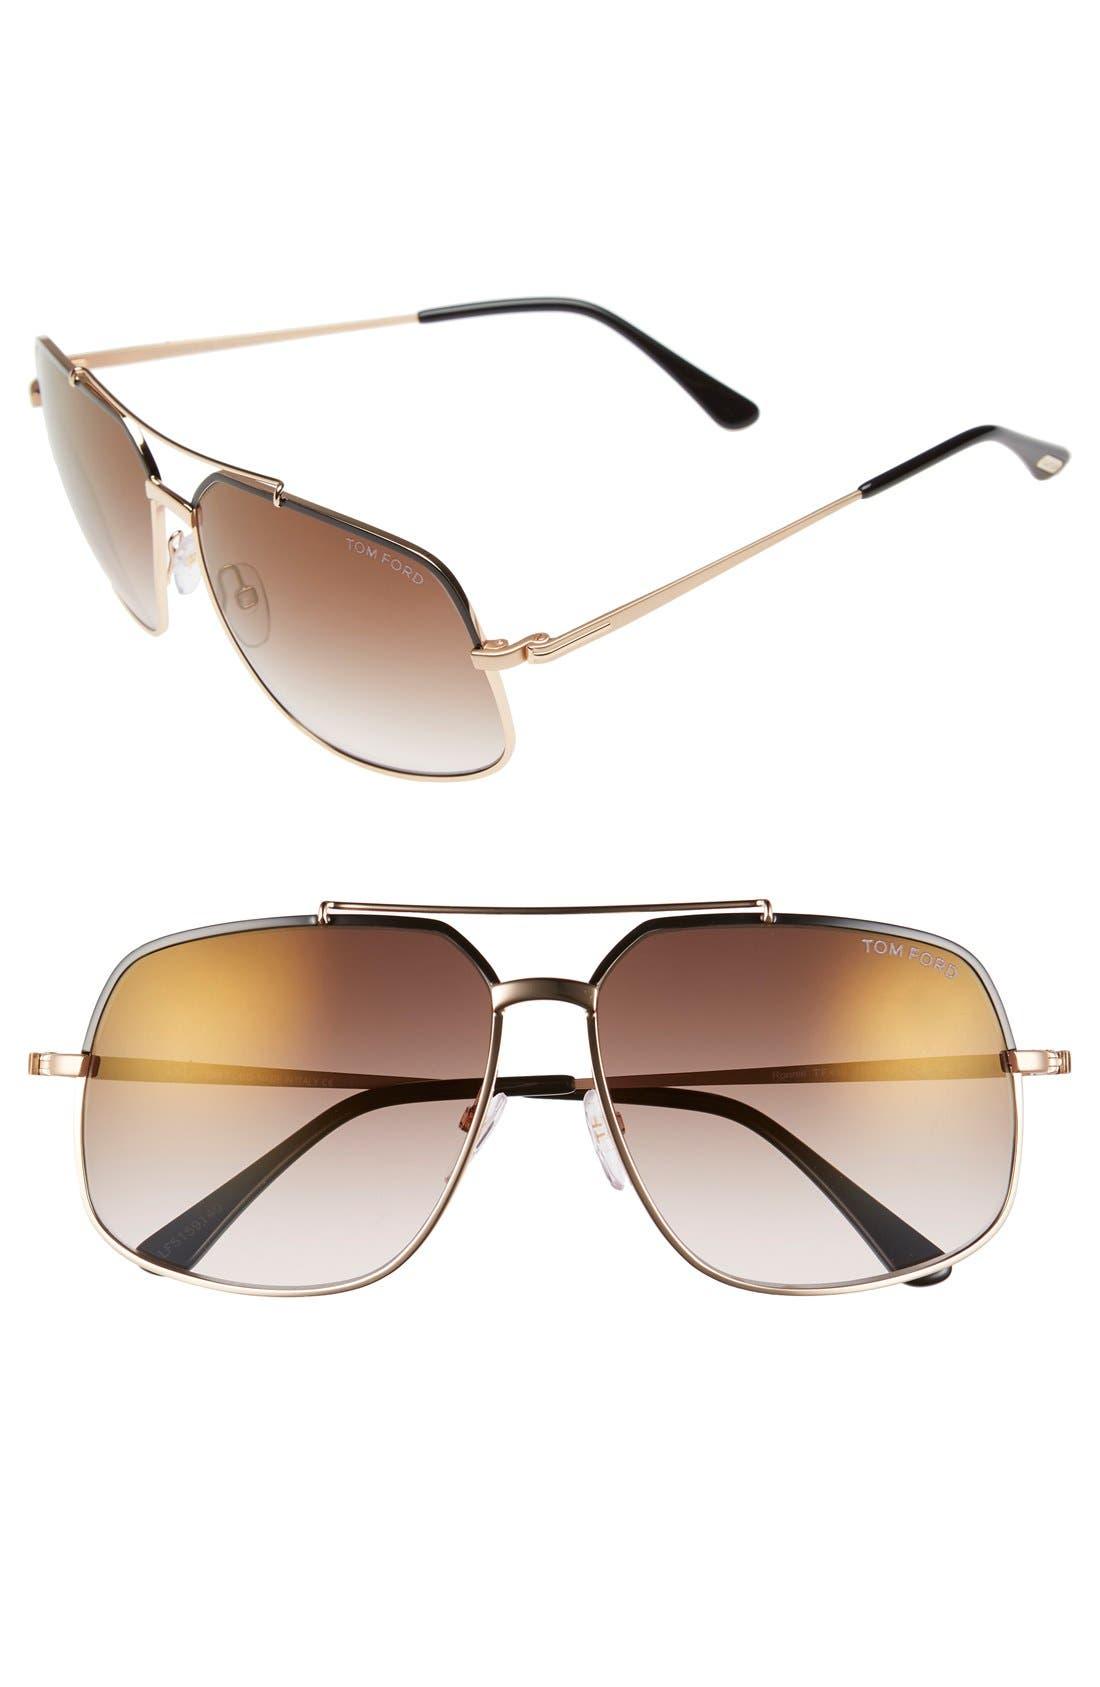 'Ronnie' 60mm Aviator Sunglasses,                             Main thumbnail 1, color,                             001